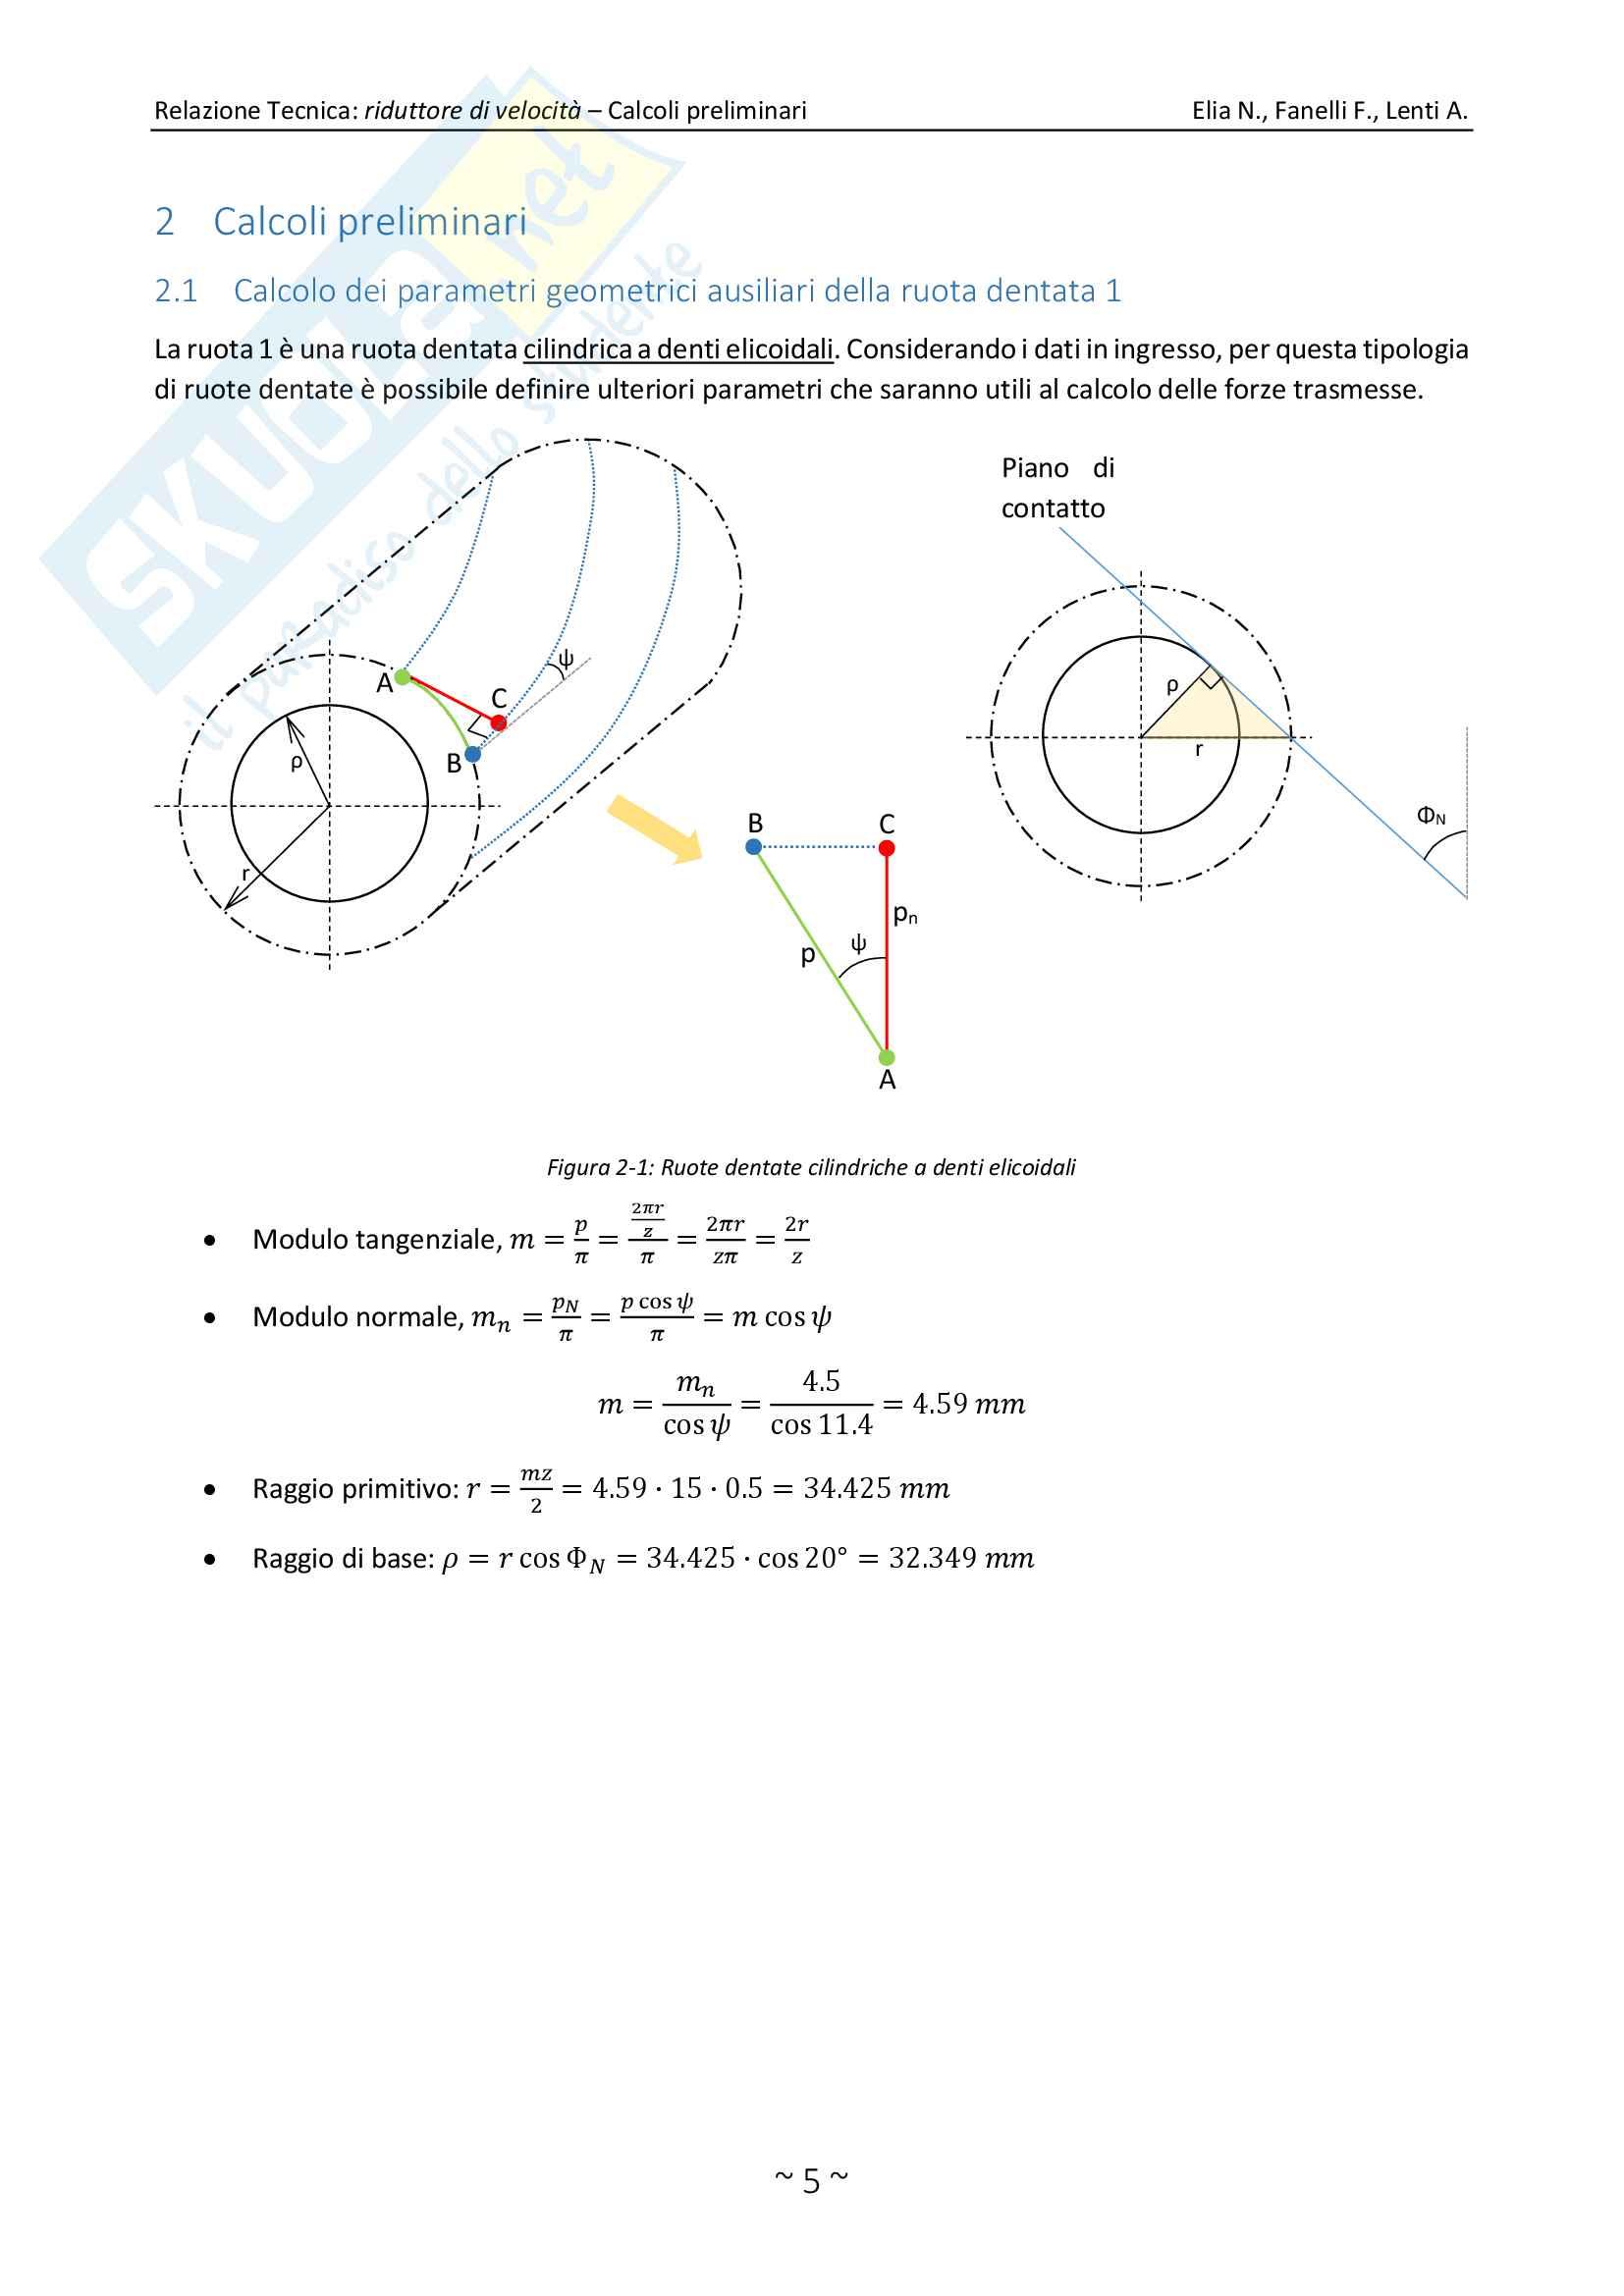 Relazione Tecnica Perfetta, Costruzione di Macchine, Berruti, Brusa Pag. 6